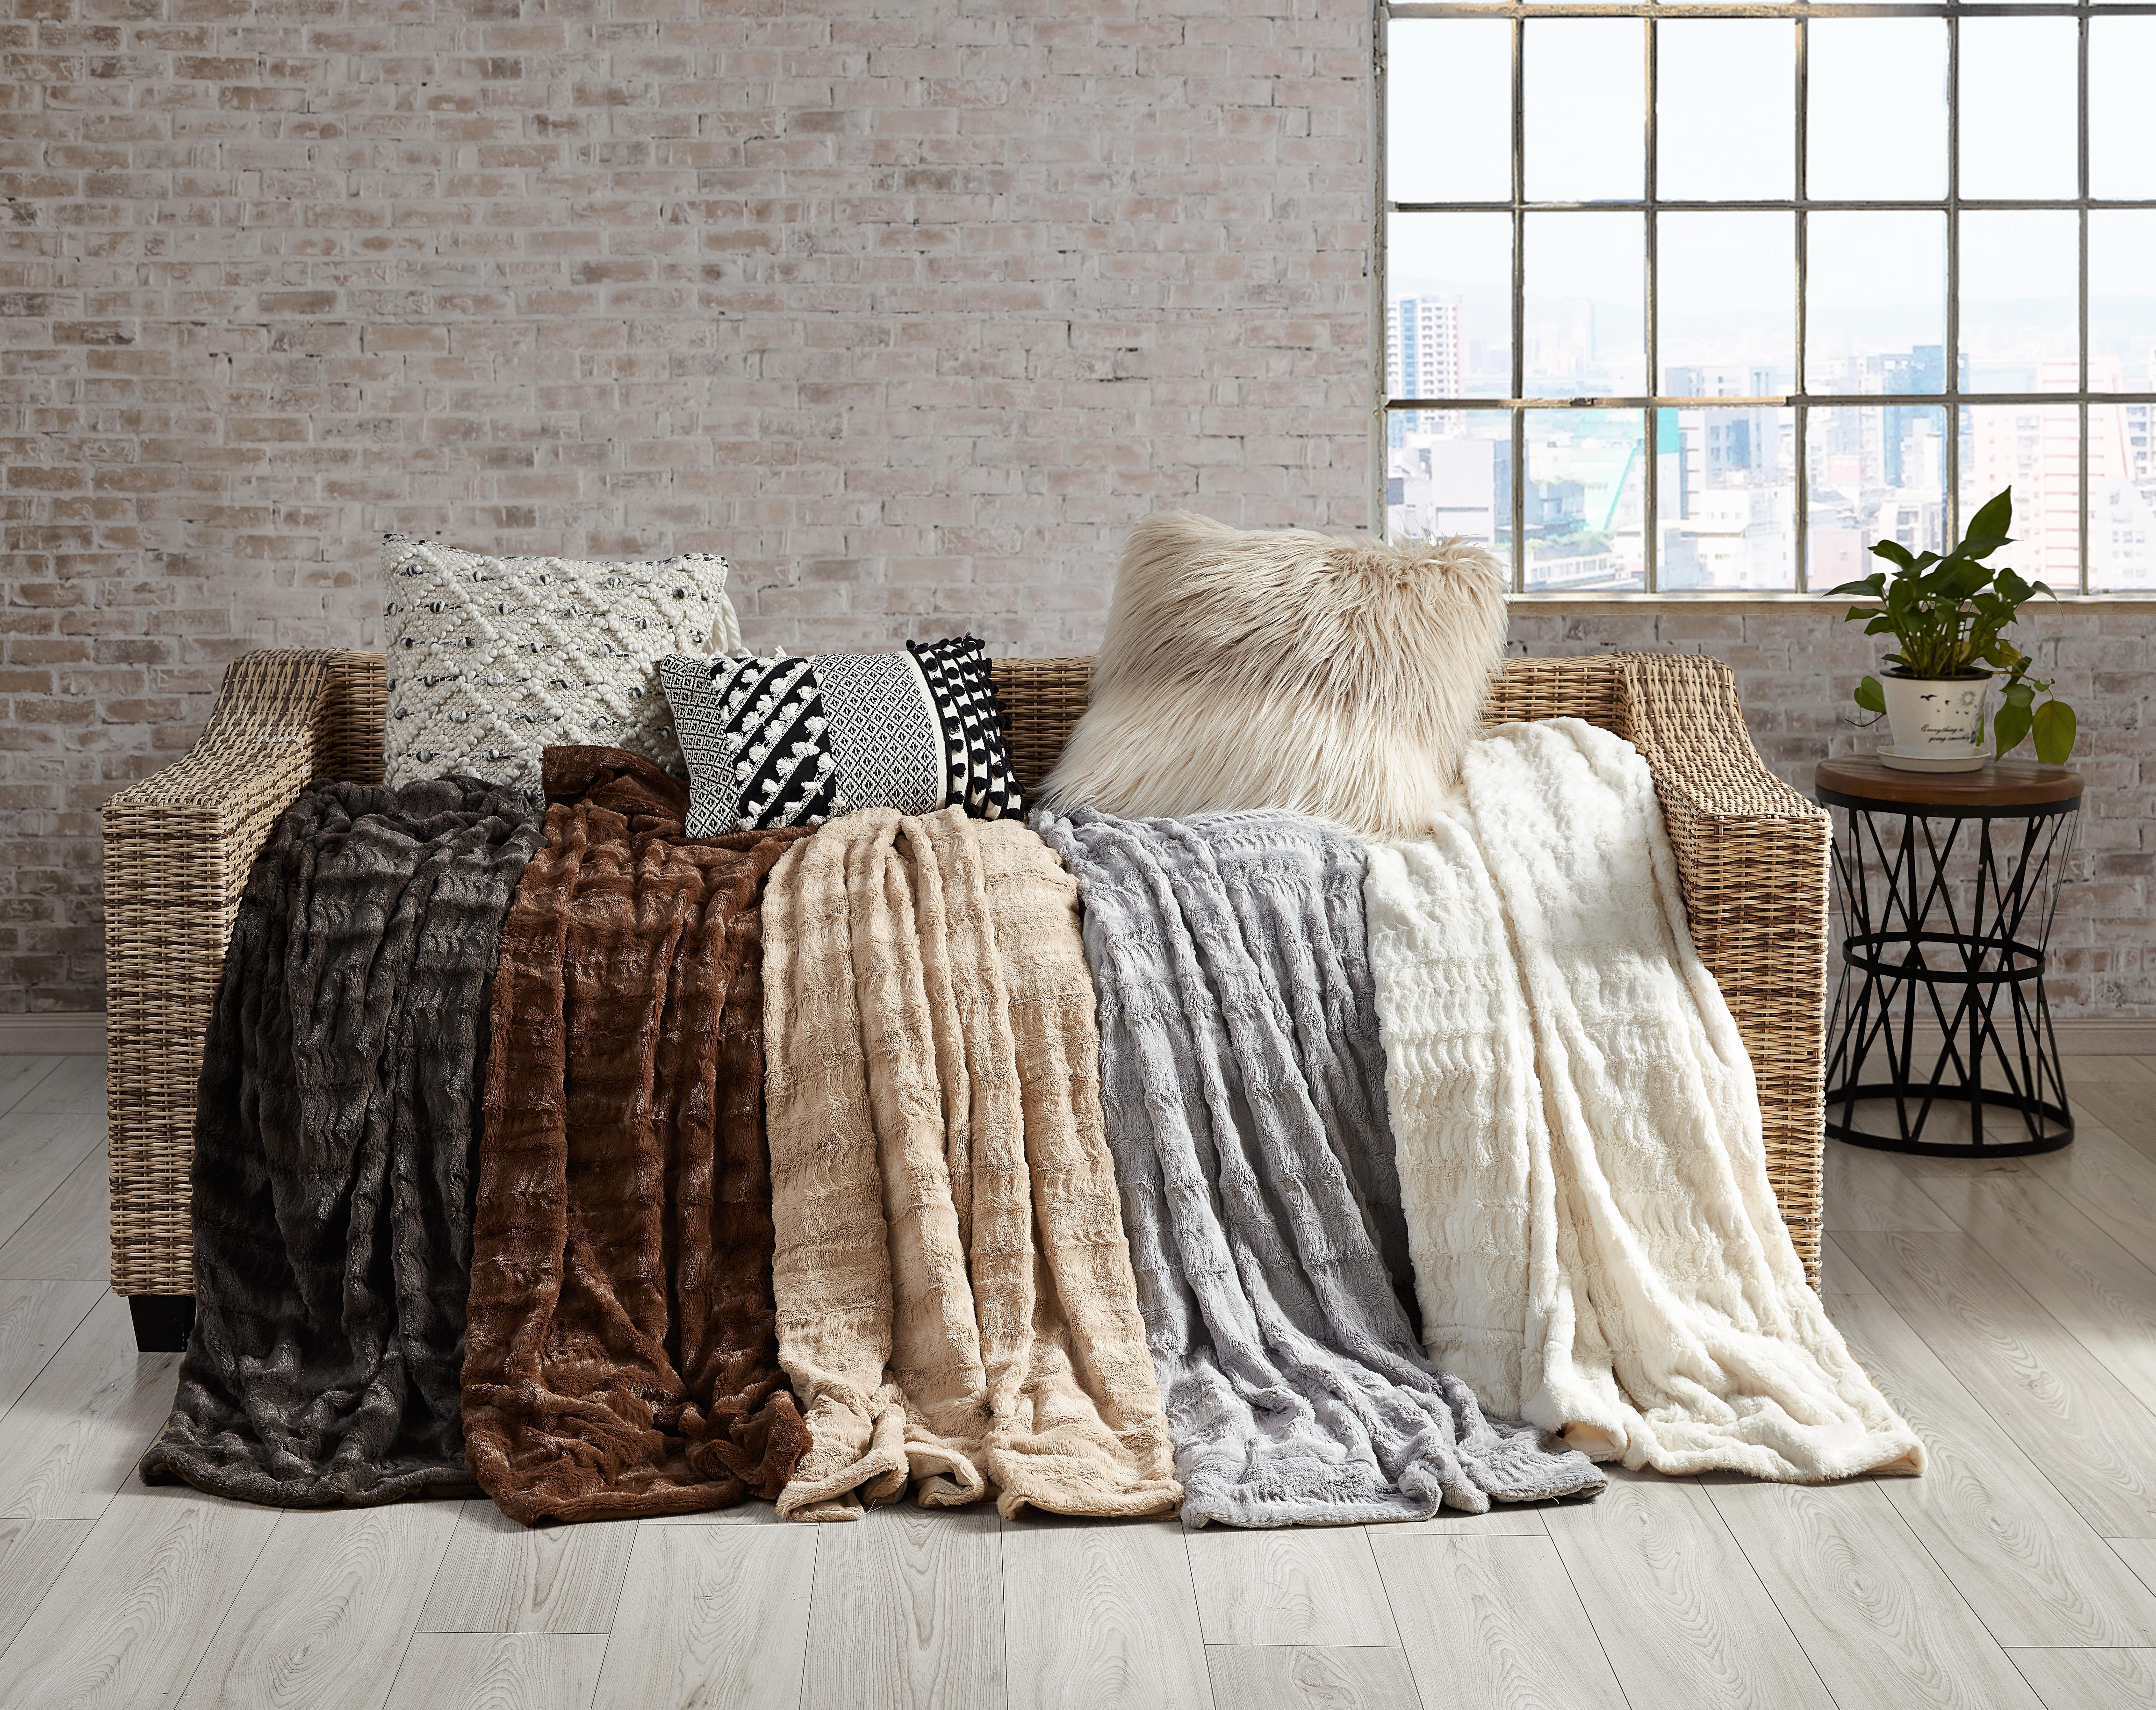 Blanket-group